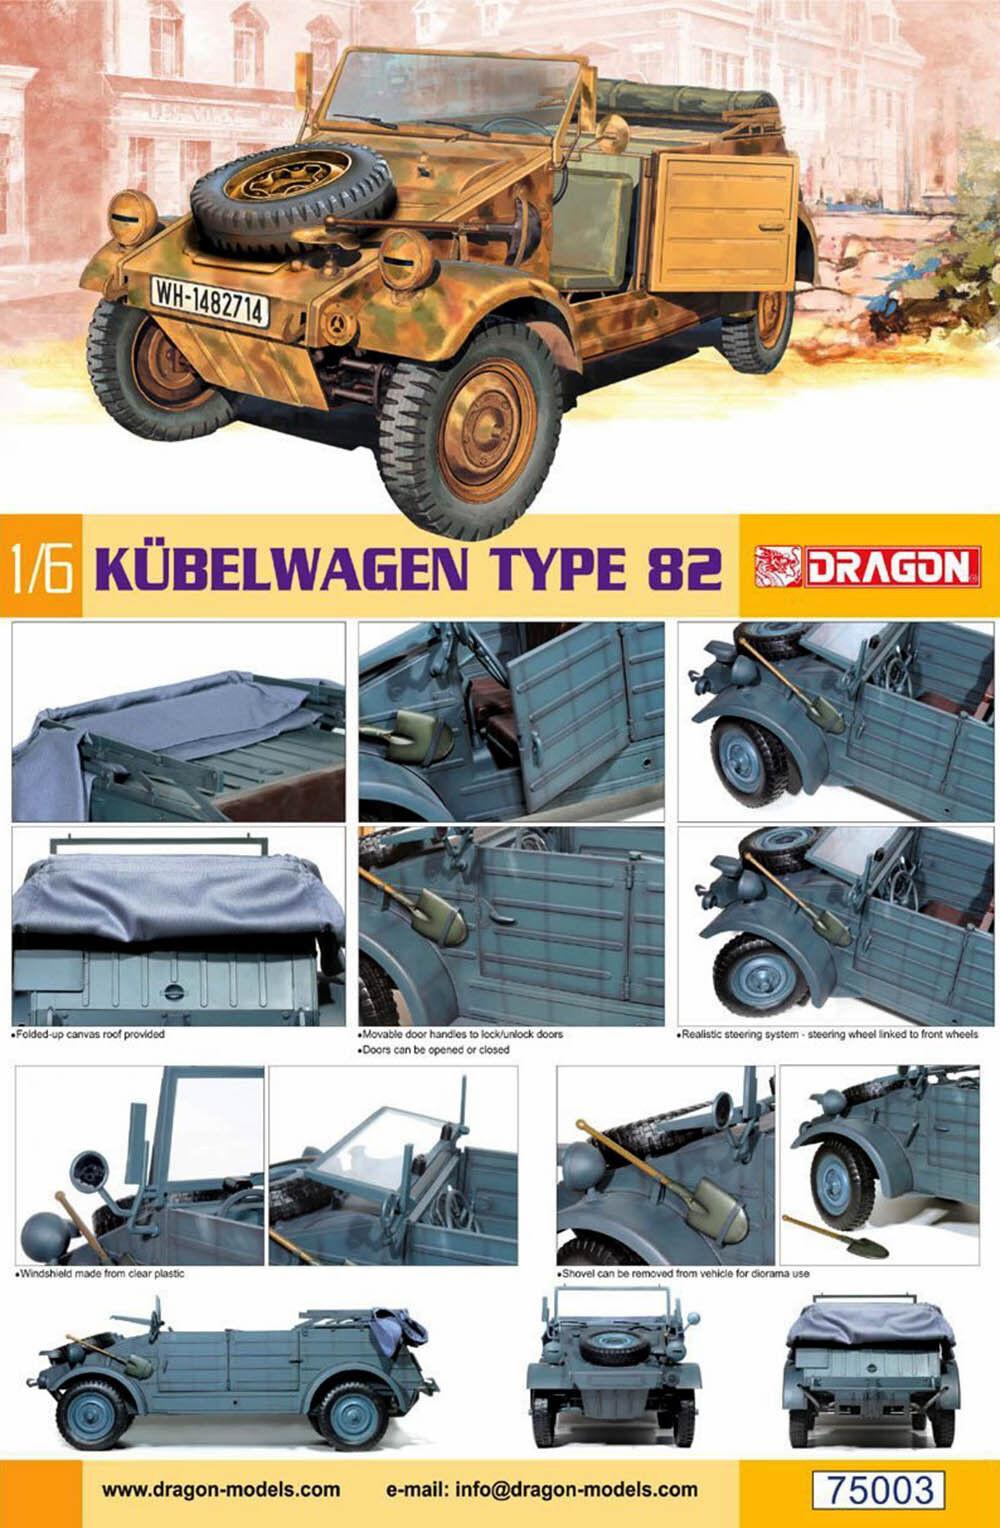 Carrello PORTAVASI Type 82 German VW VOLKSWAGEN 1 6 MODEL KIT KIT Dragon 75003